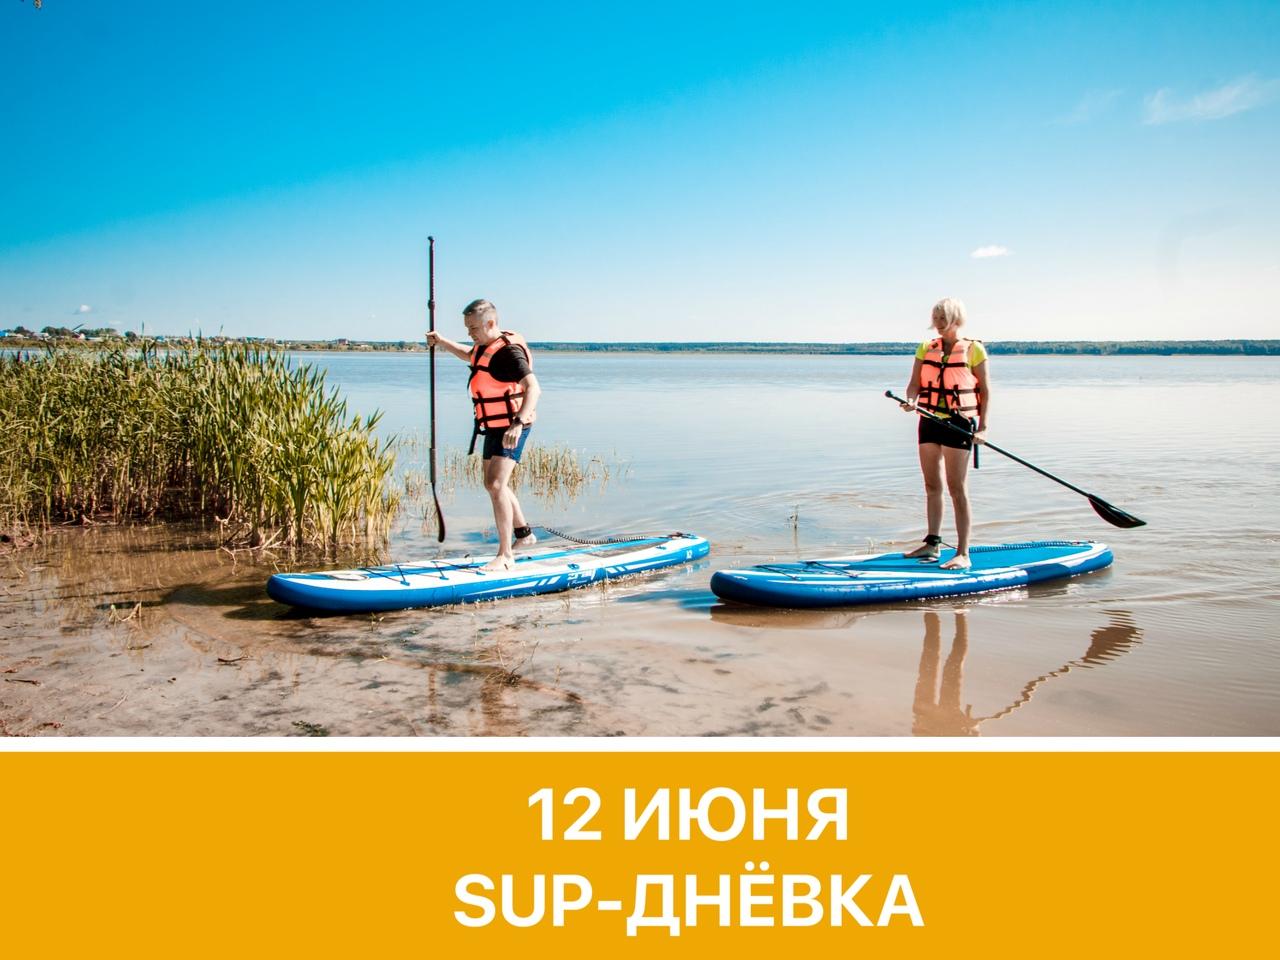 Афиша Тюмень ВЕЛО-SUP днёвка 2.0 / 12 июня